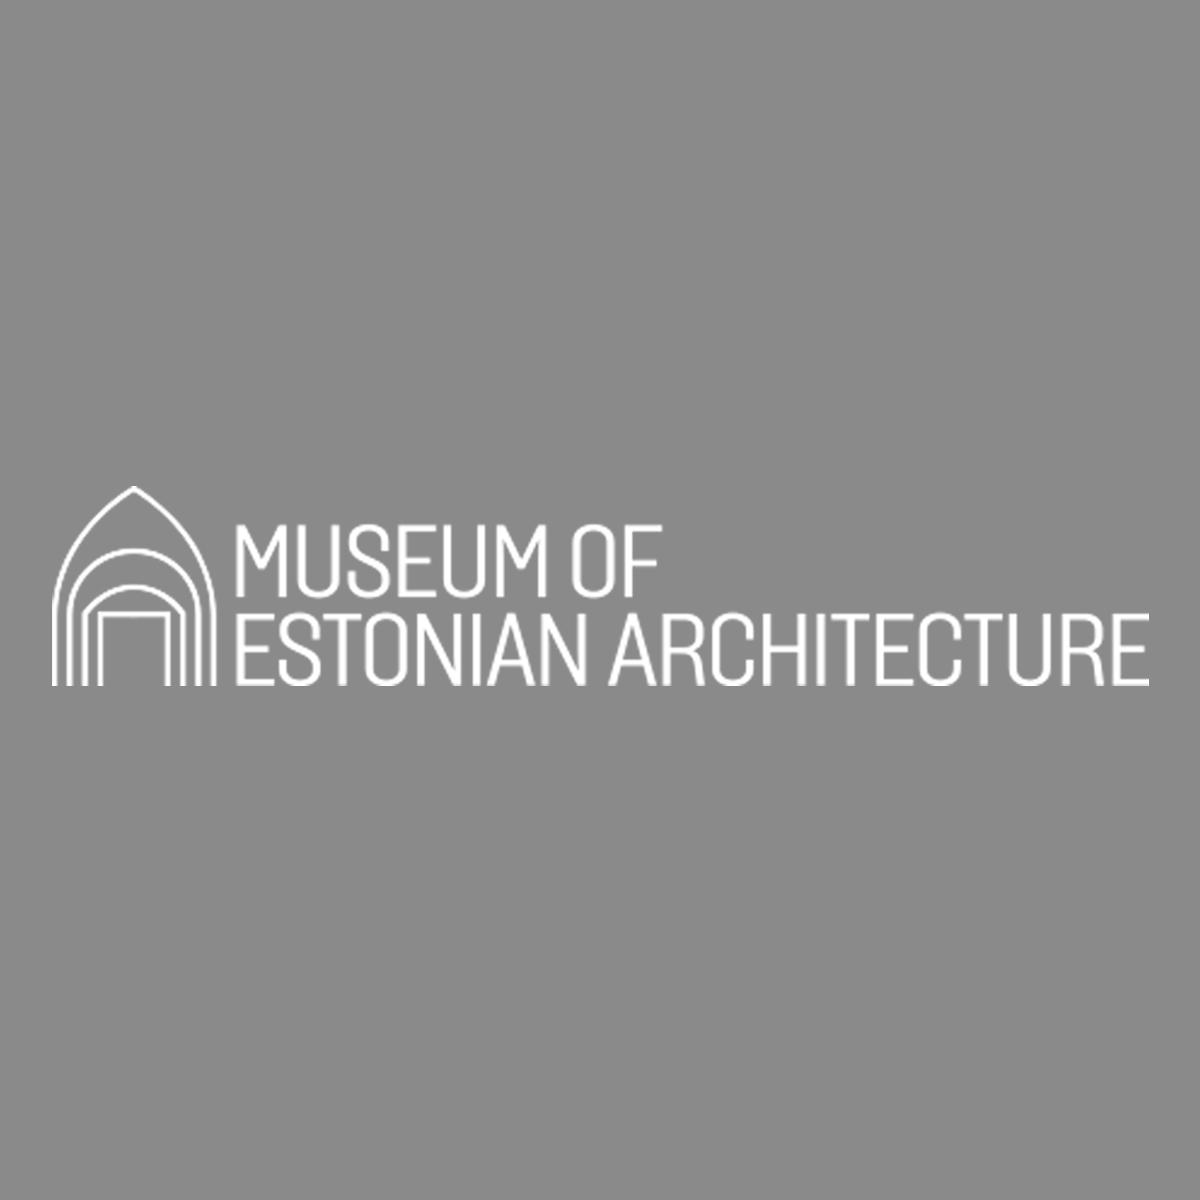 Museum-of-EtonianArch_LOGO_Grey.jpg